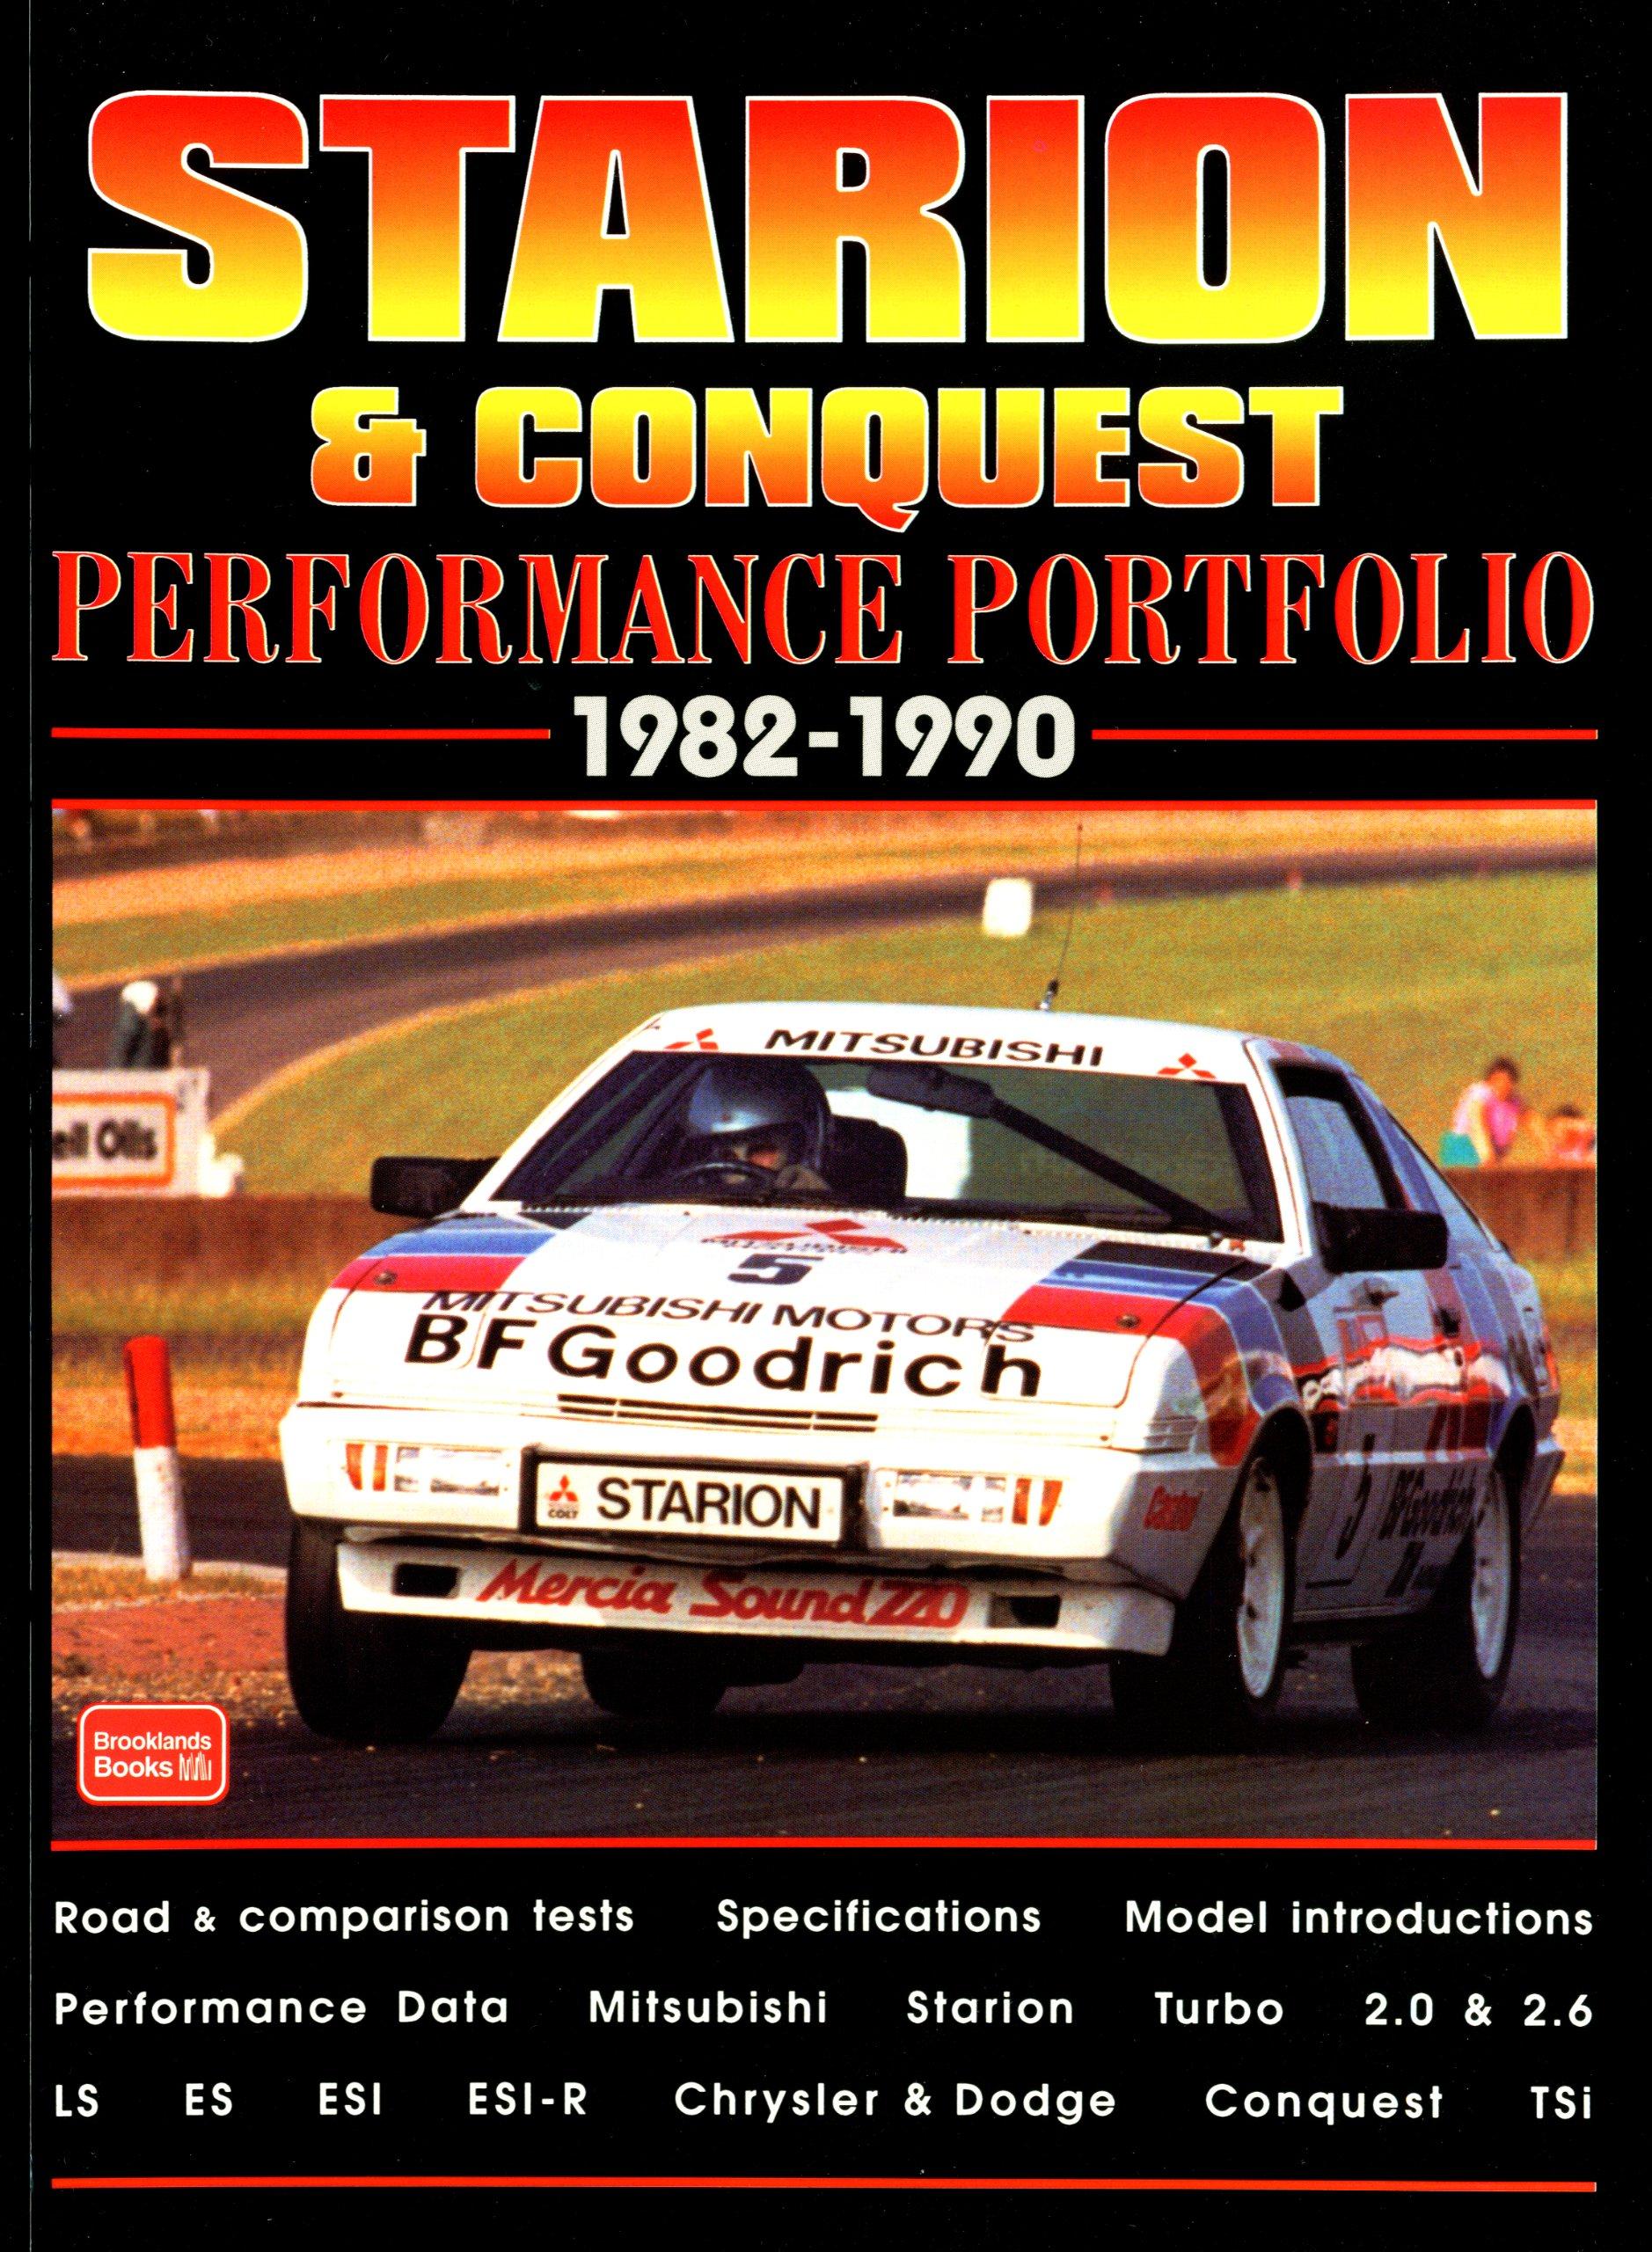 Starion Conquest Performance Portfolio 1982 90 Rm Clarke Mitsubishi Dodge 9781855205710 Books